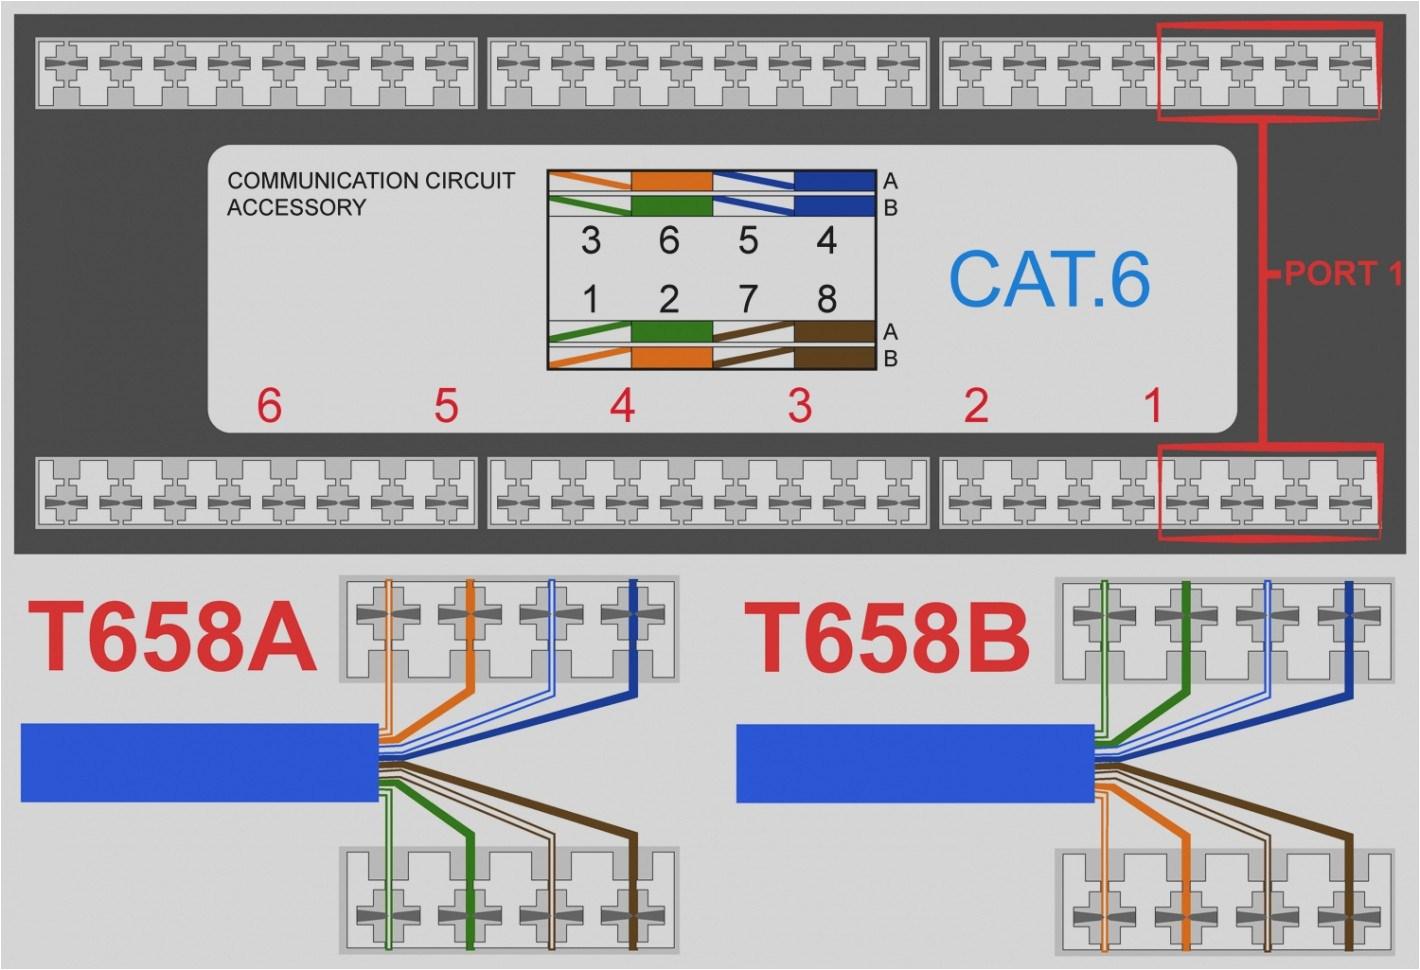 cat6 ethernet wiring diagram wiring diagram cat 6 ethernet wall jack wiring